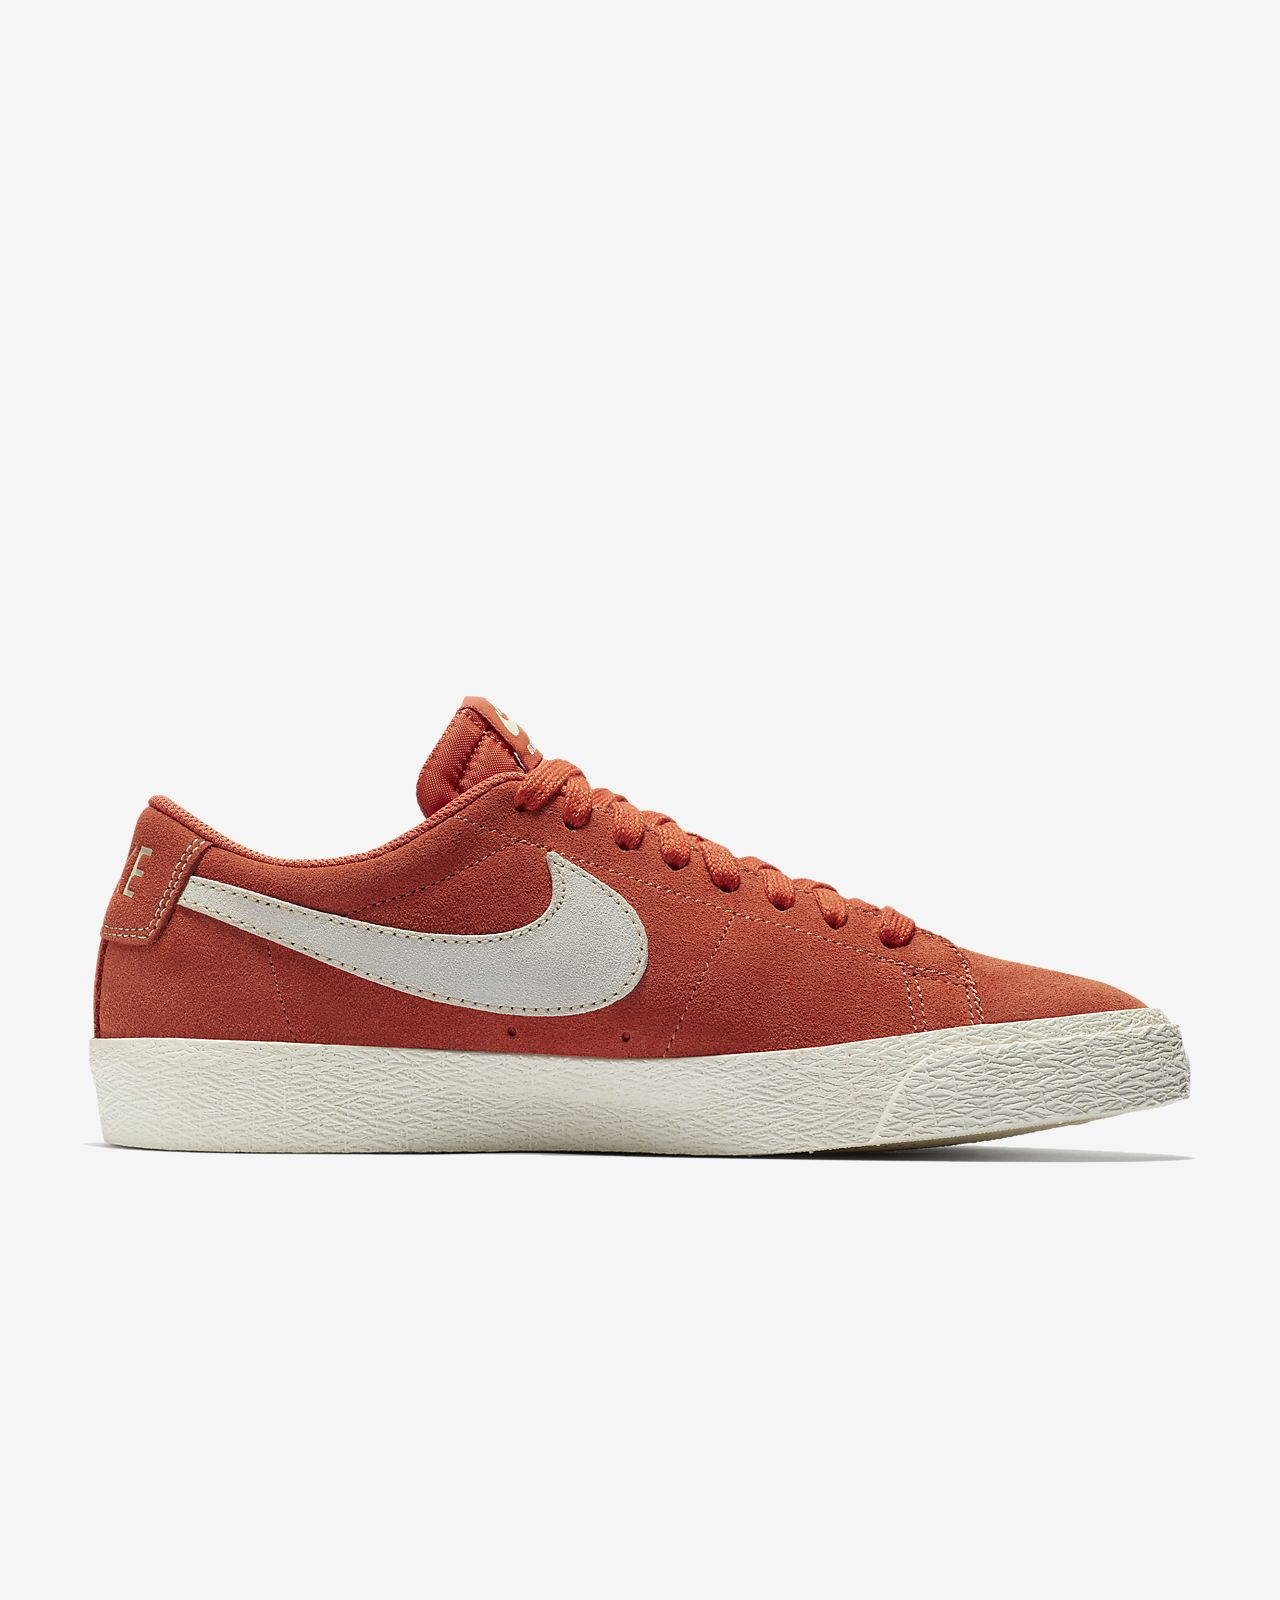 Nike Blazer Chaussures En Taille 46 Hommes 4i2VTQ0X